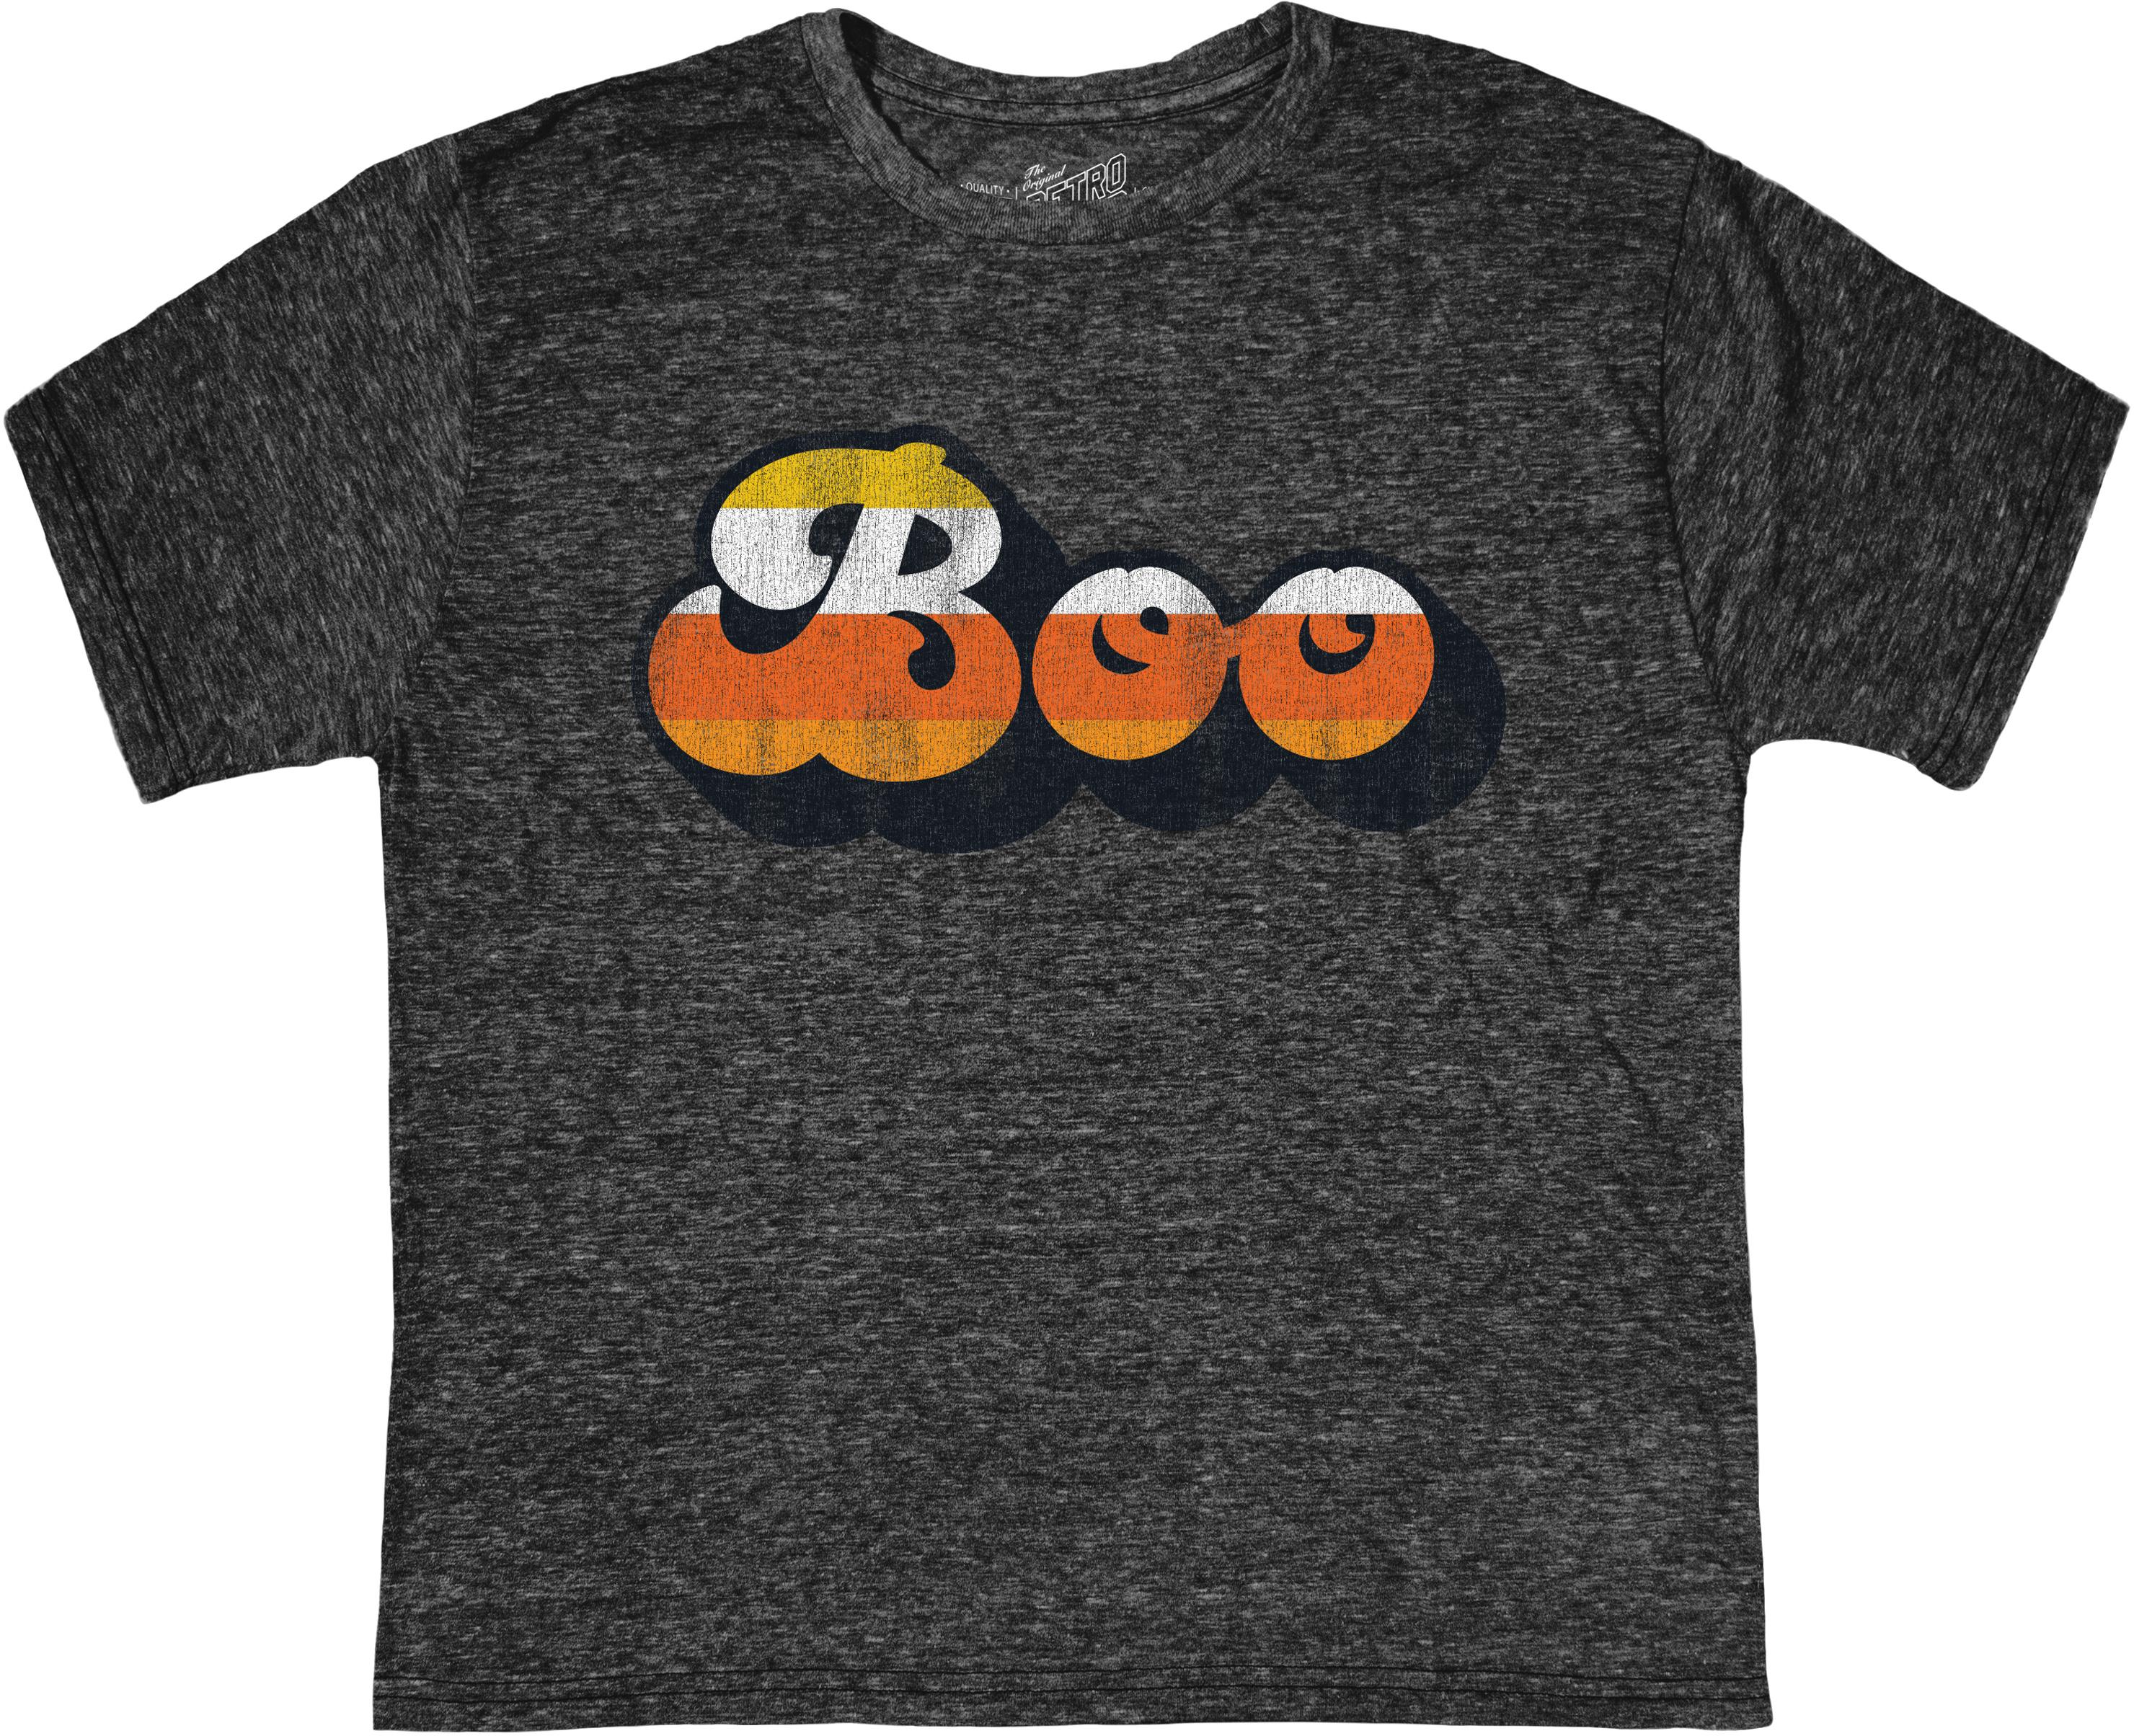 Футболка Tri-Blend Boo Halloween с круглым вырезом (для малышей) The Original Retro Brand Kids